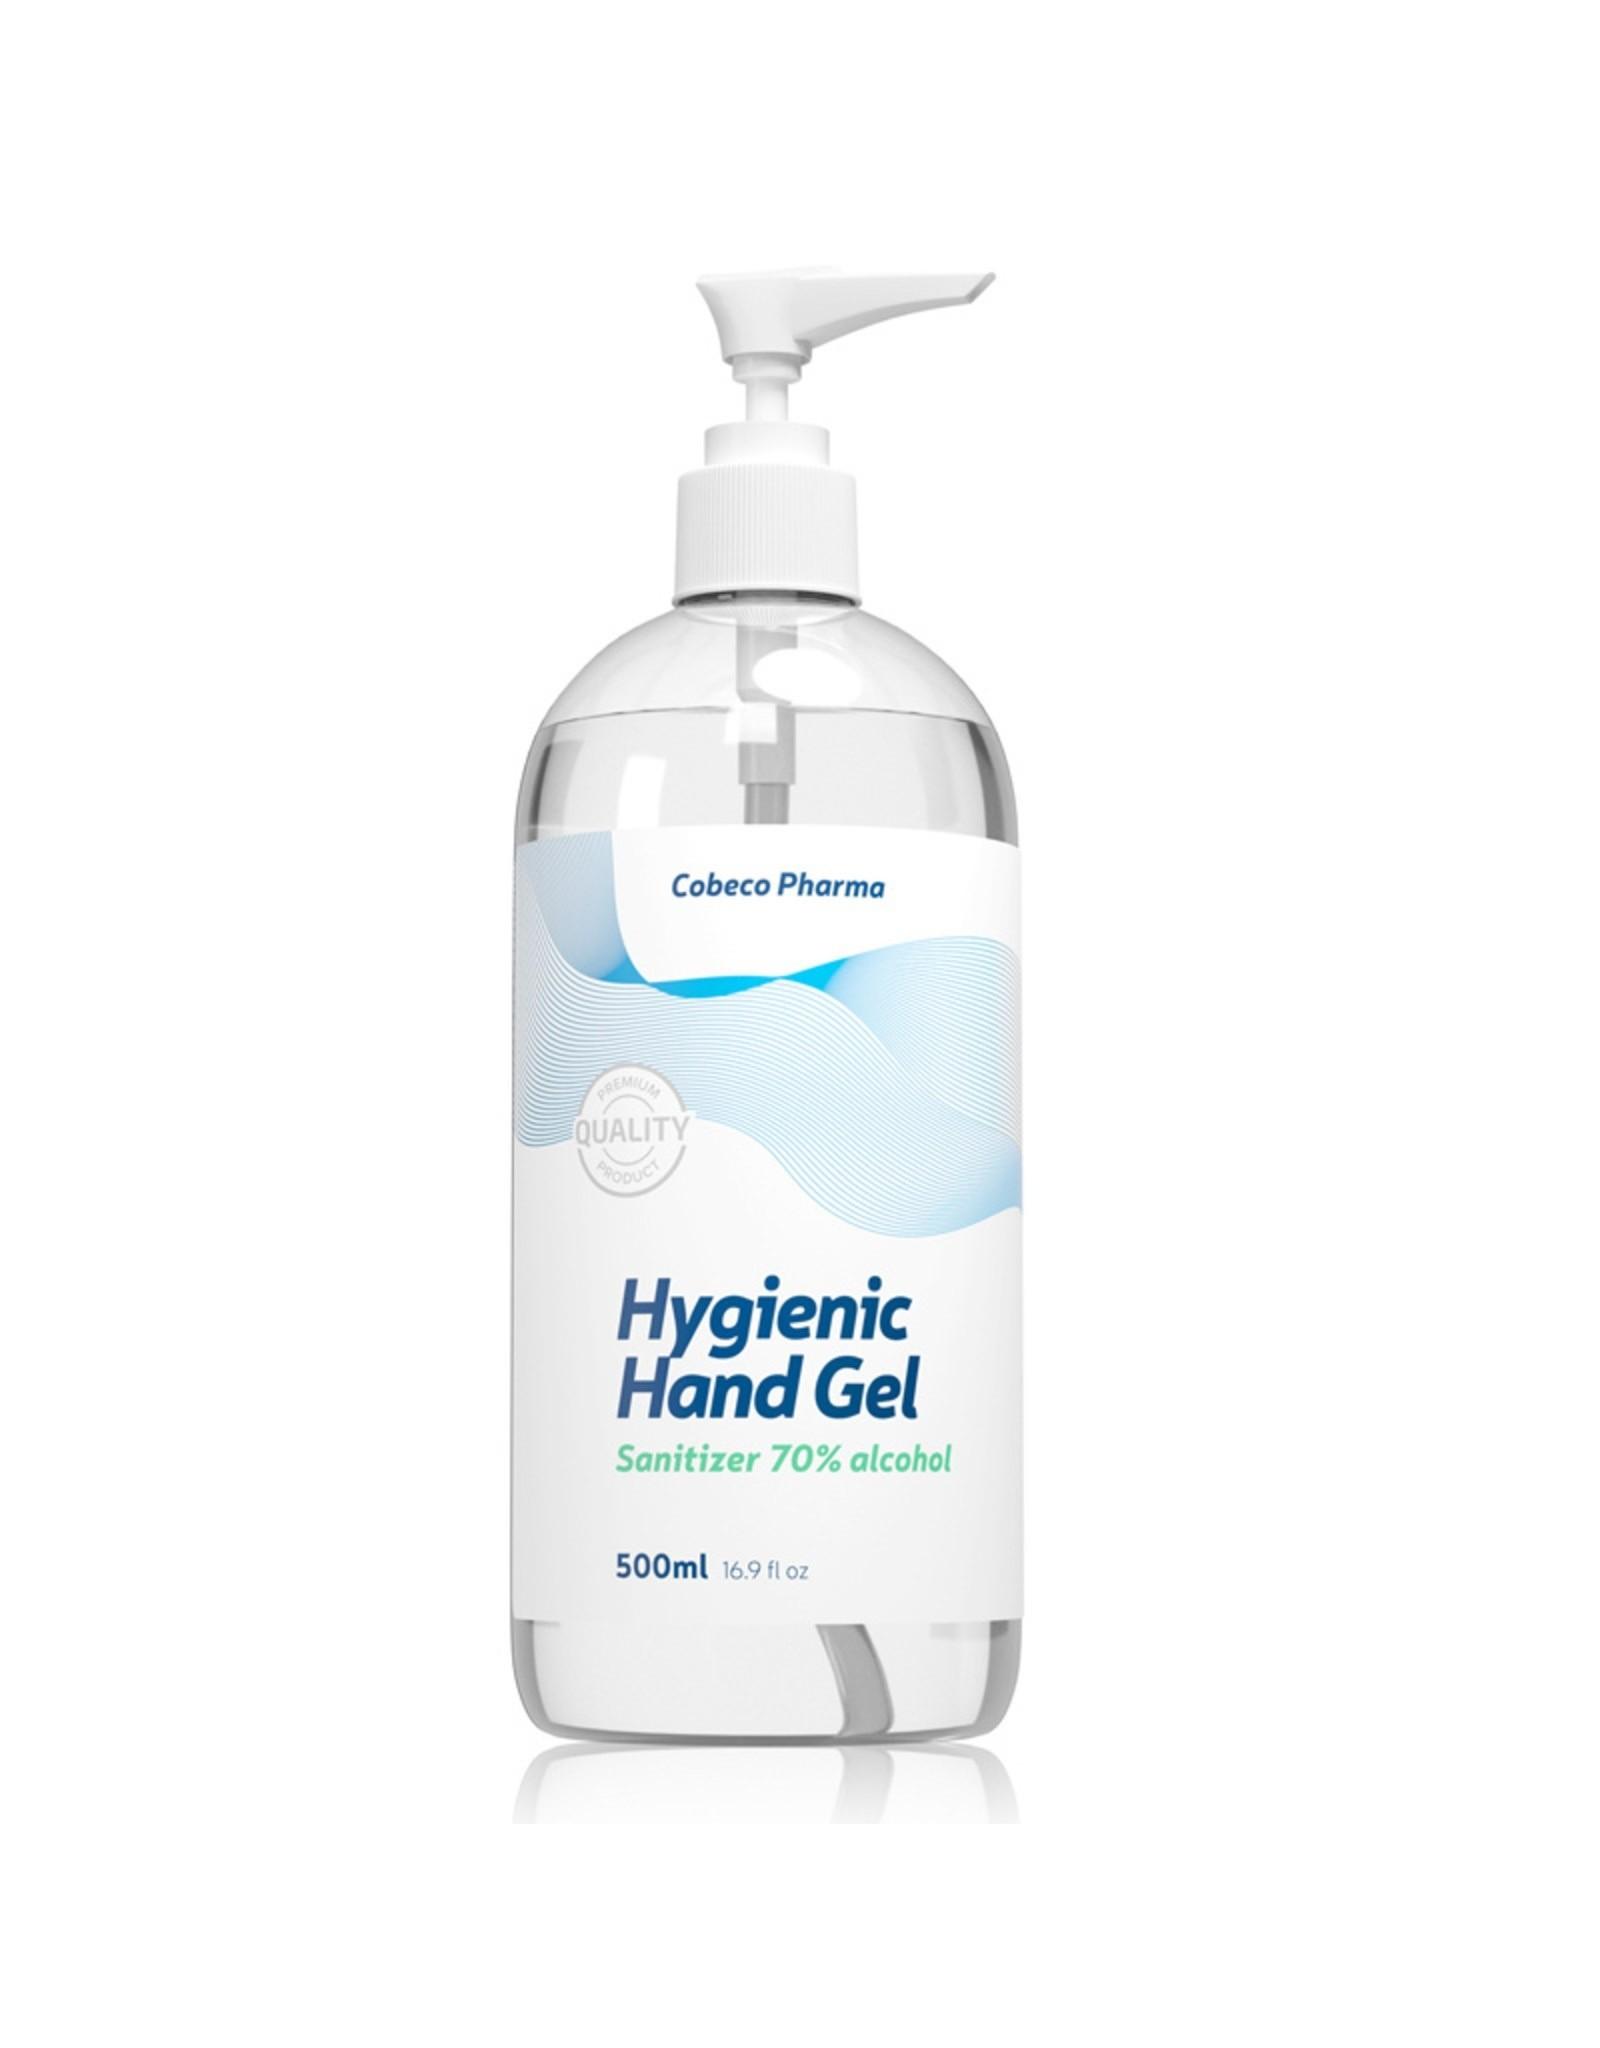 Cobeco Pharma Cobeco Hygienic handalcohol gel (Desinfecterende handalcohol)  (70%alc.) 500ml